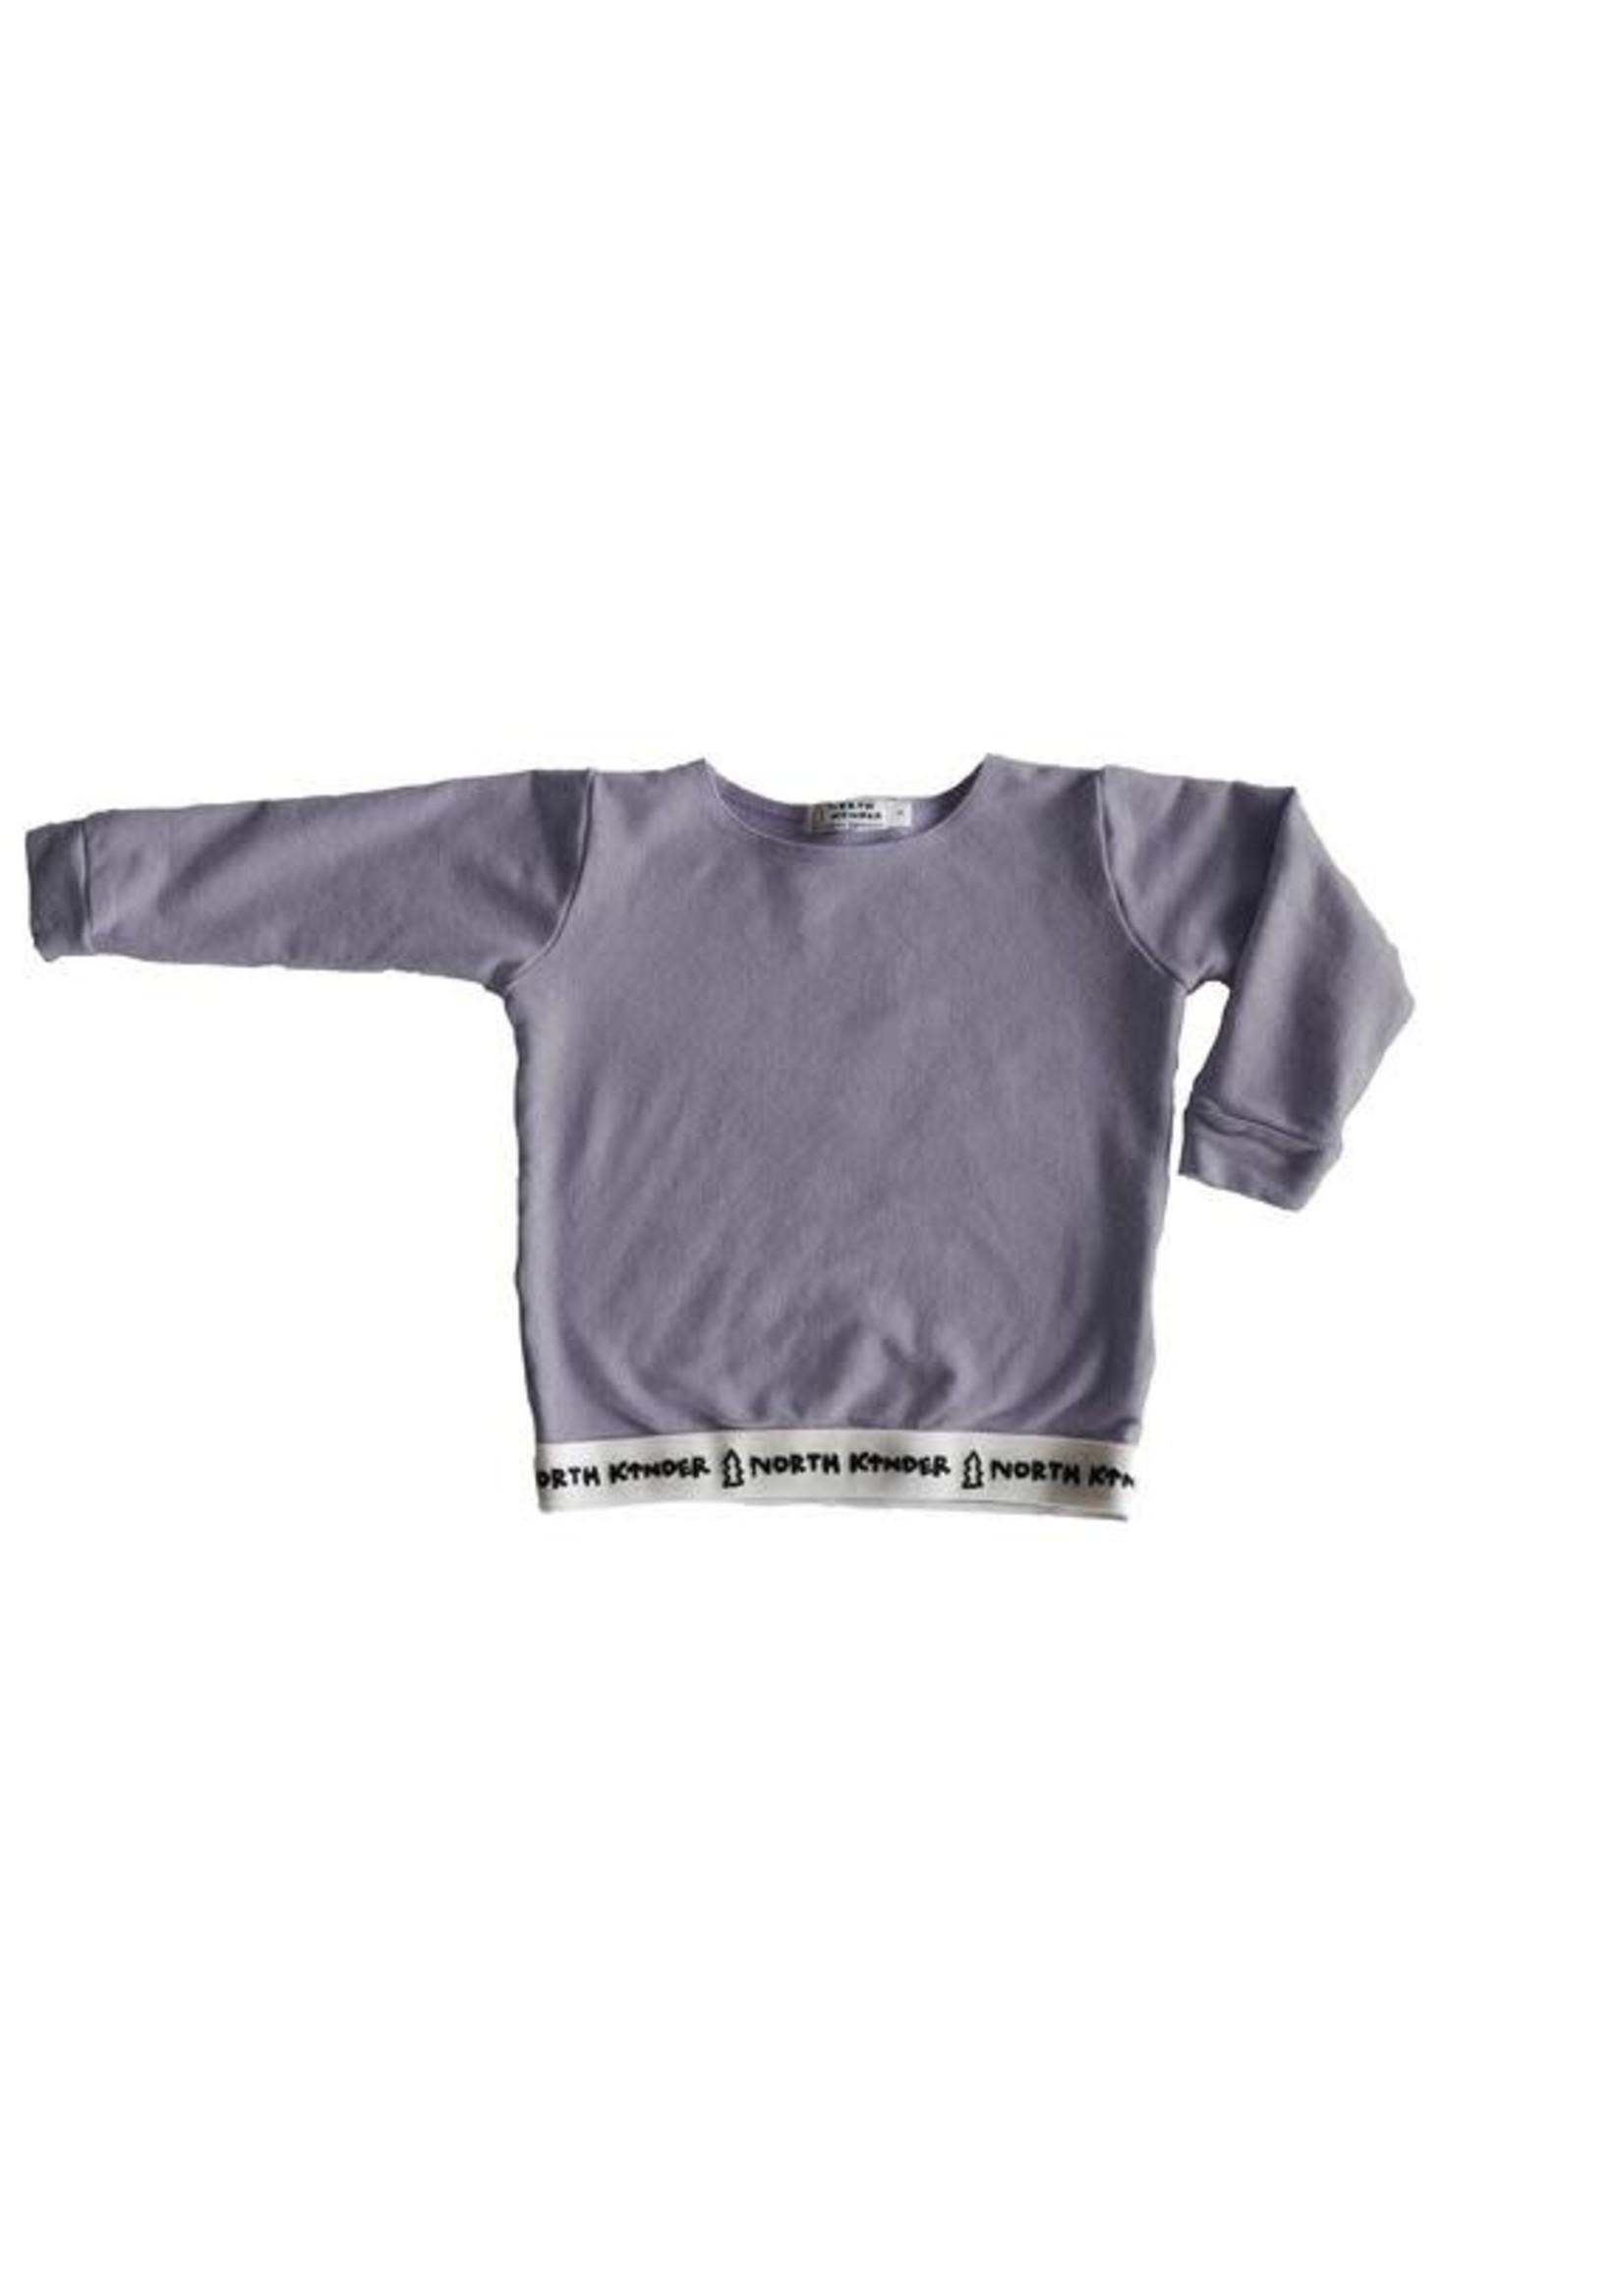 North Kinder NK speed sweater